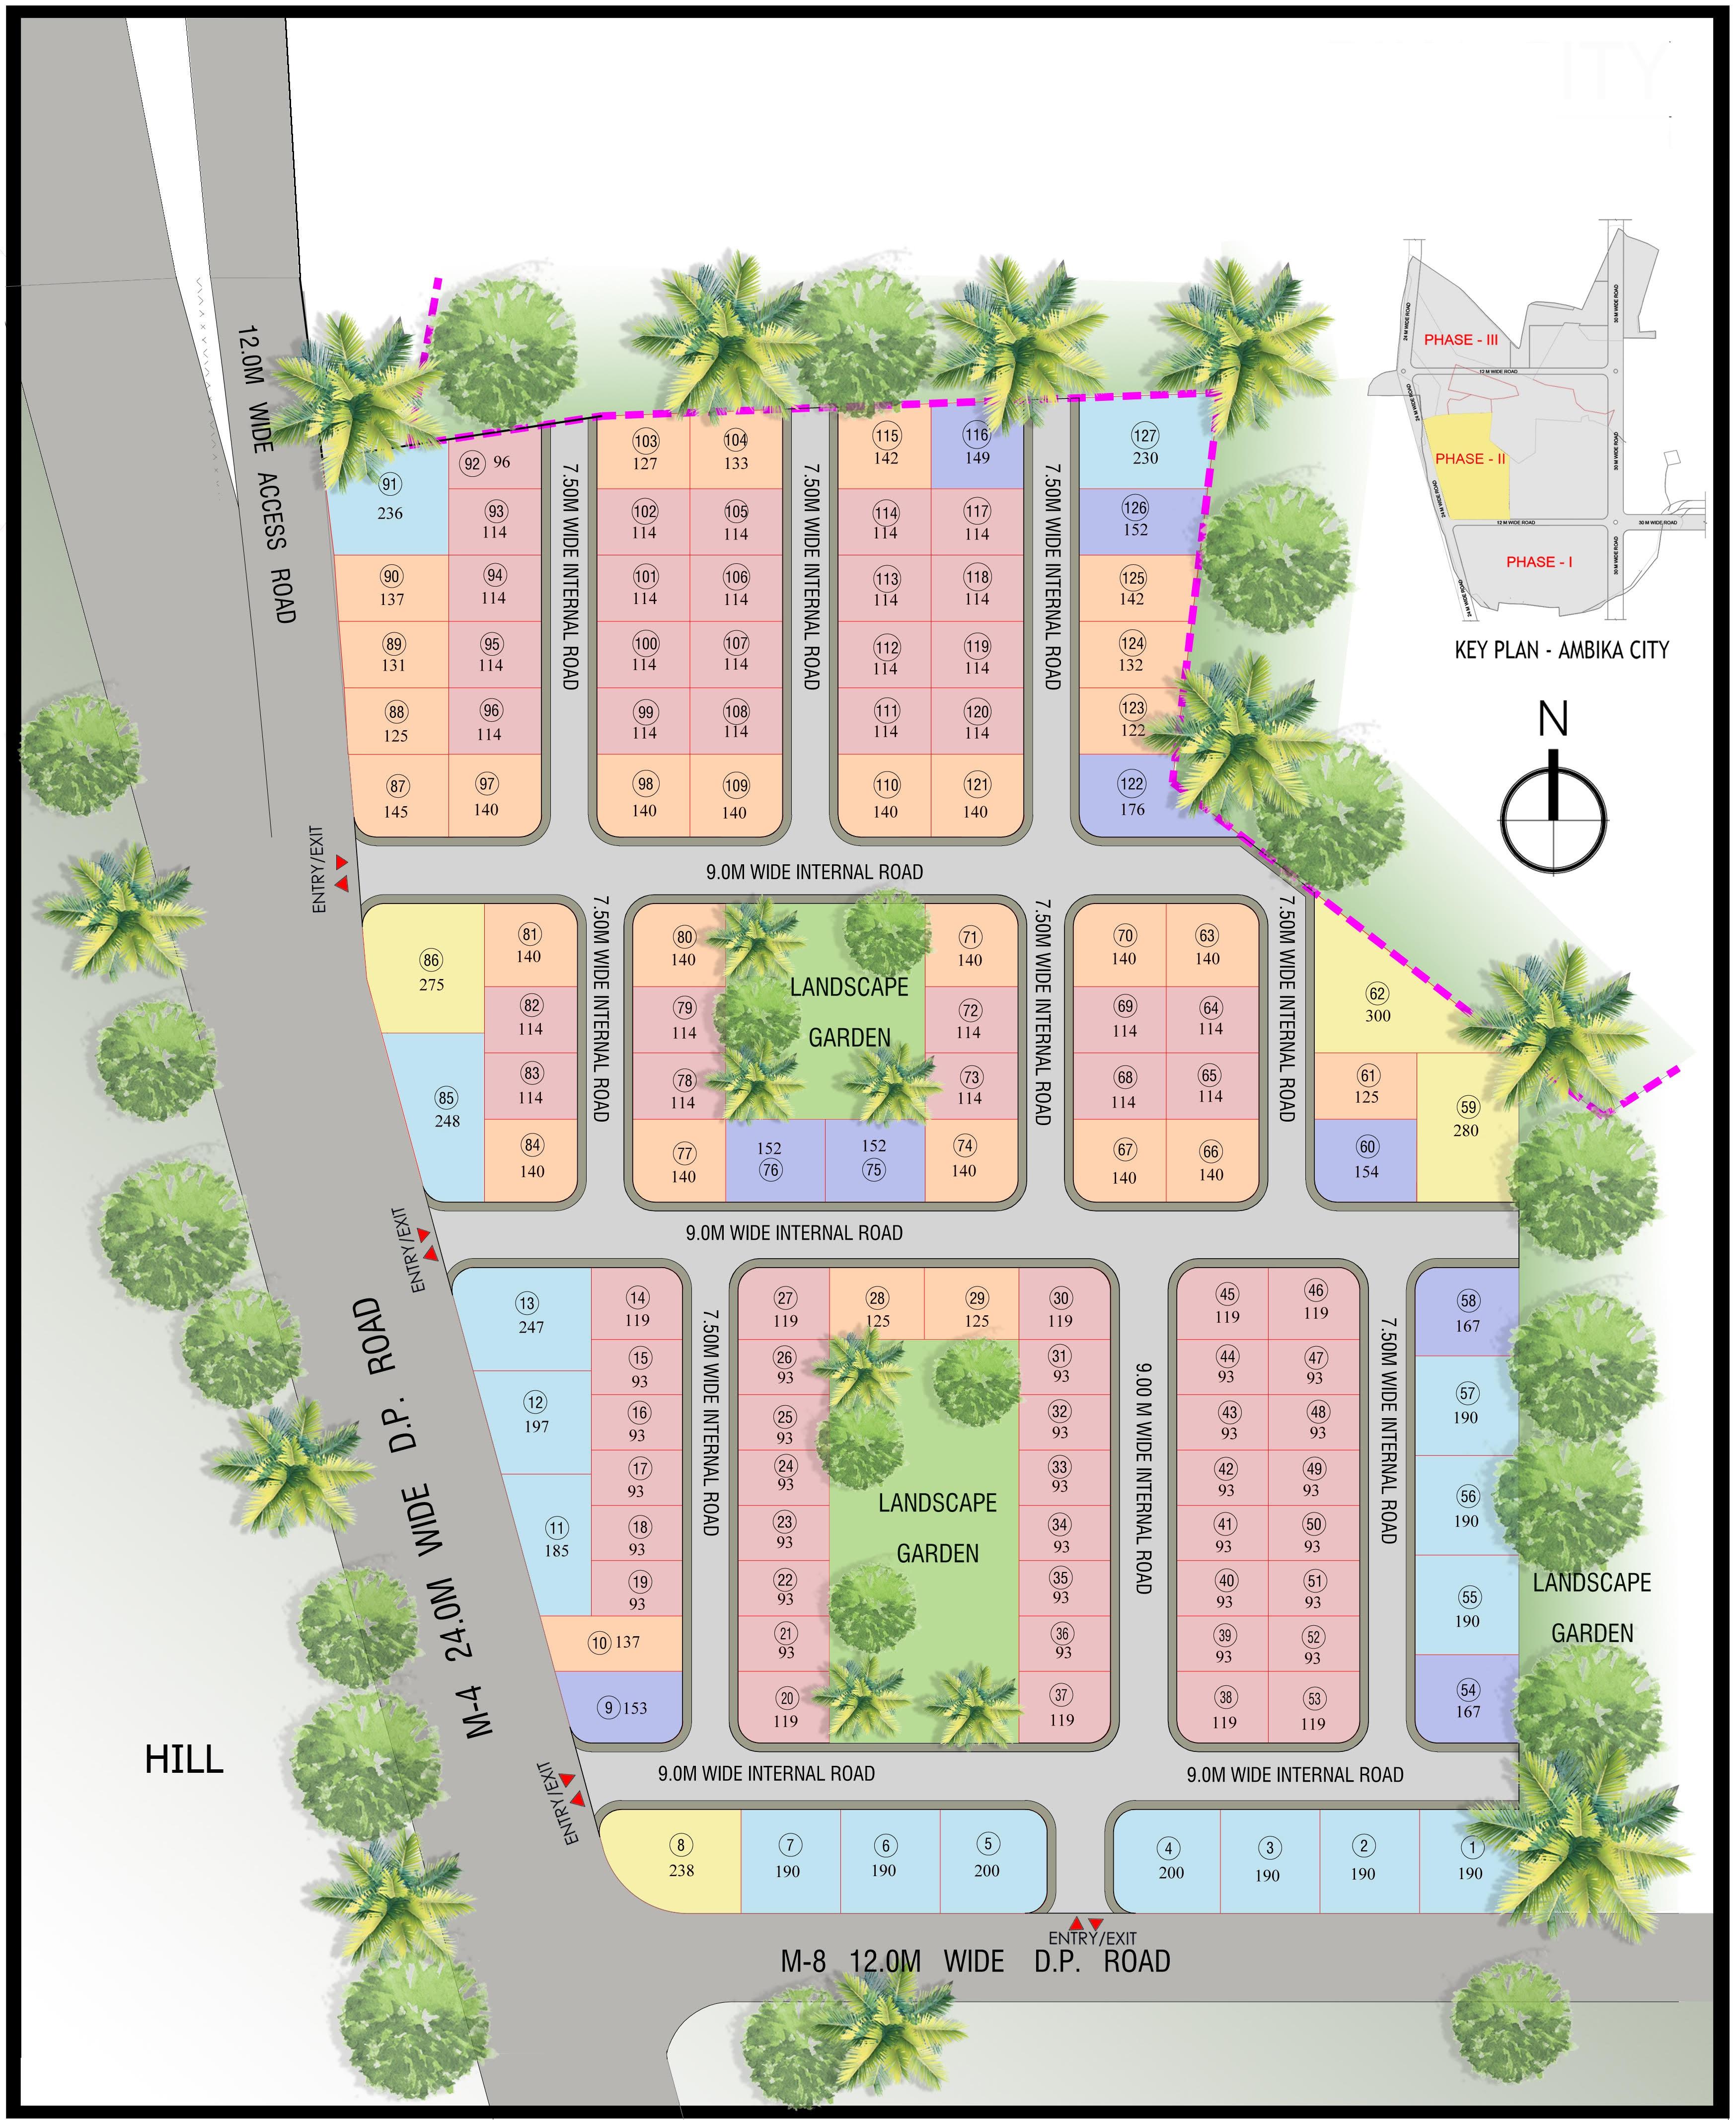 ambika city master plan image1